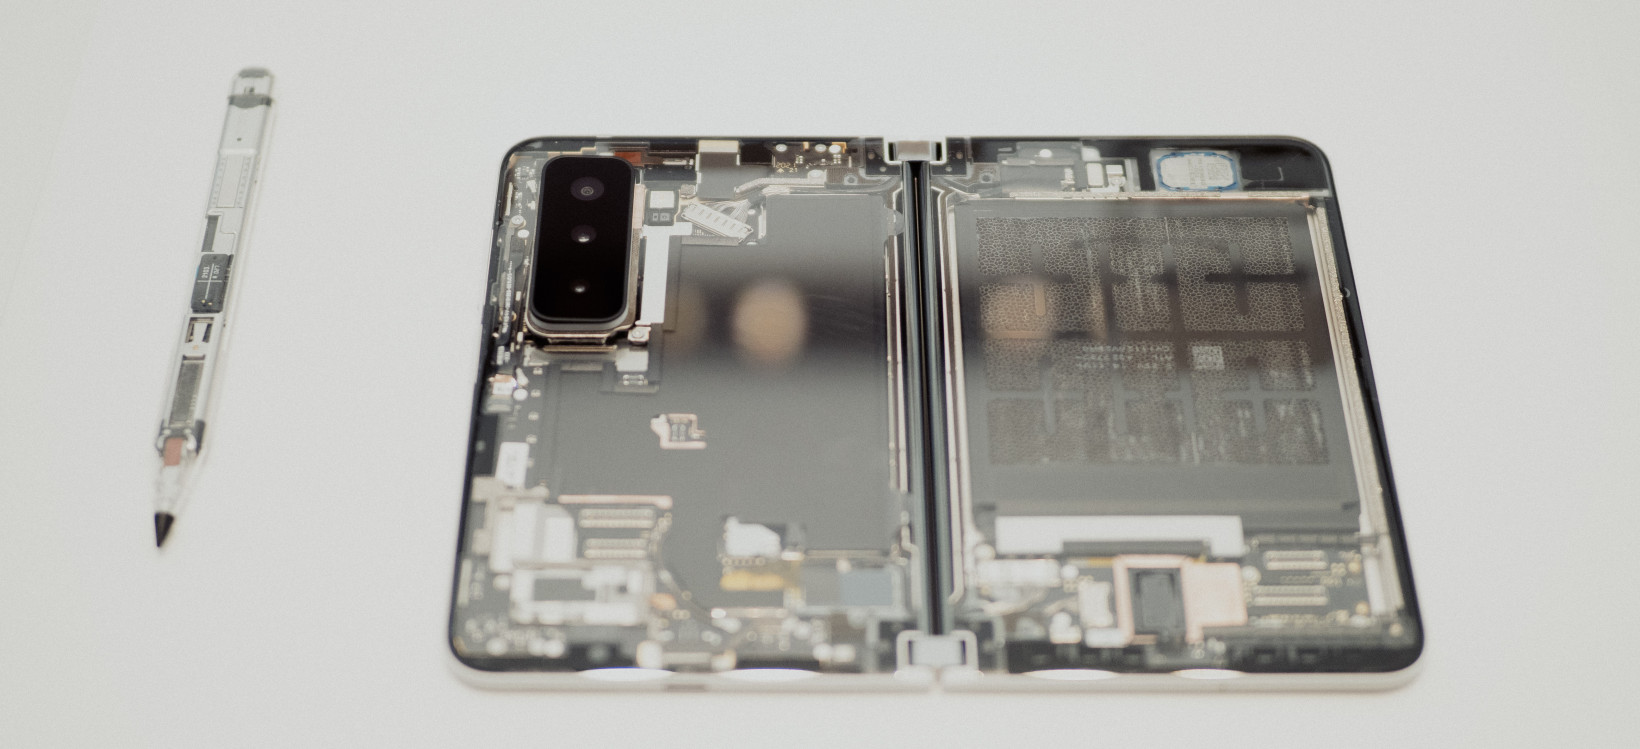 Surface Duo 2 Internals